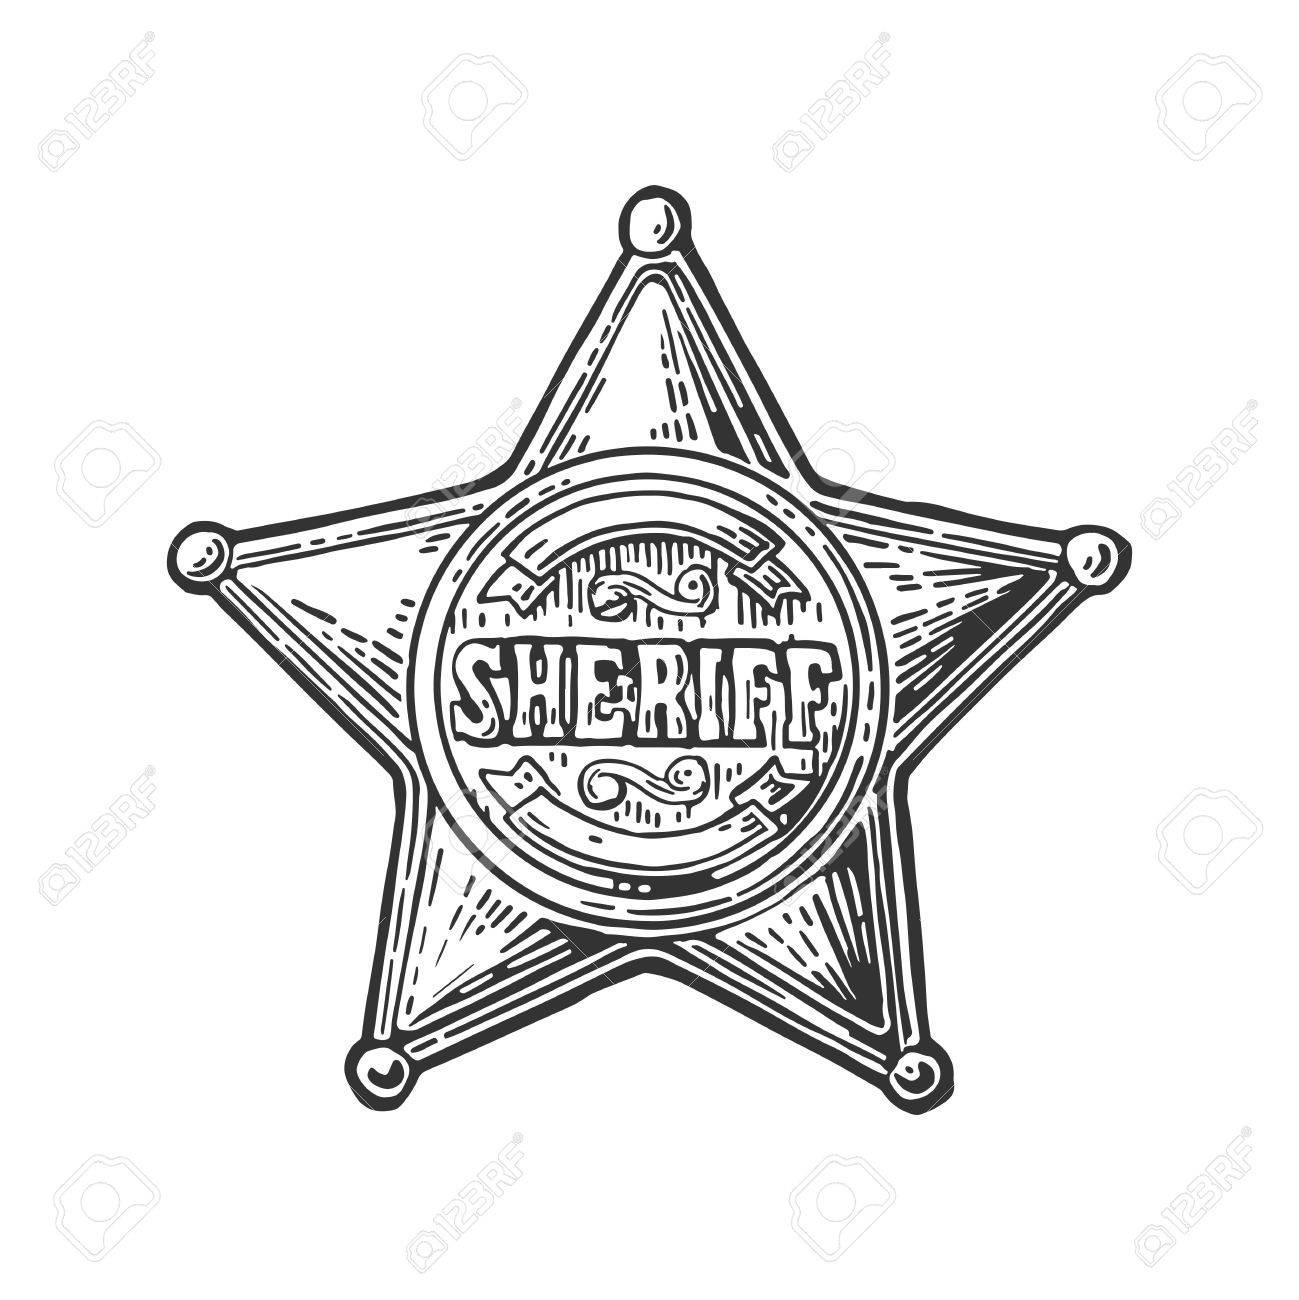 Attractive Star Trek Badge Template Mold - Resume Ideas - namanasa.com